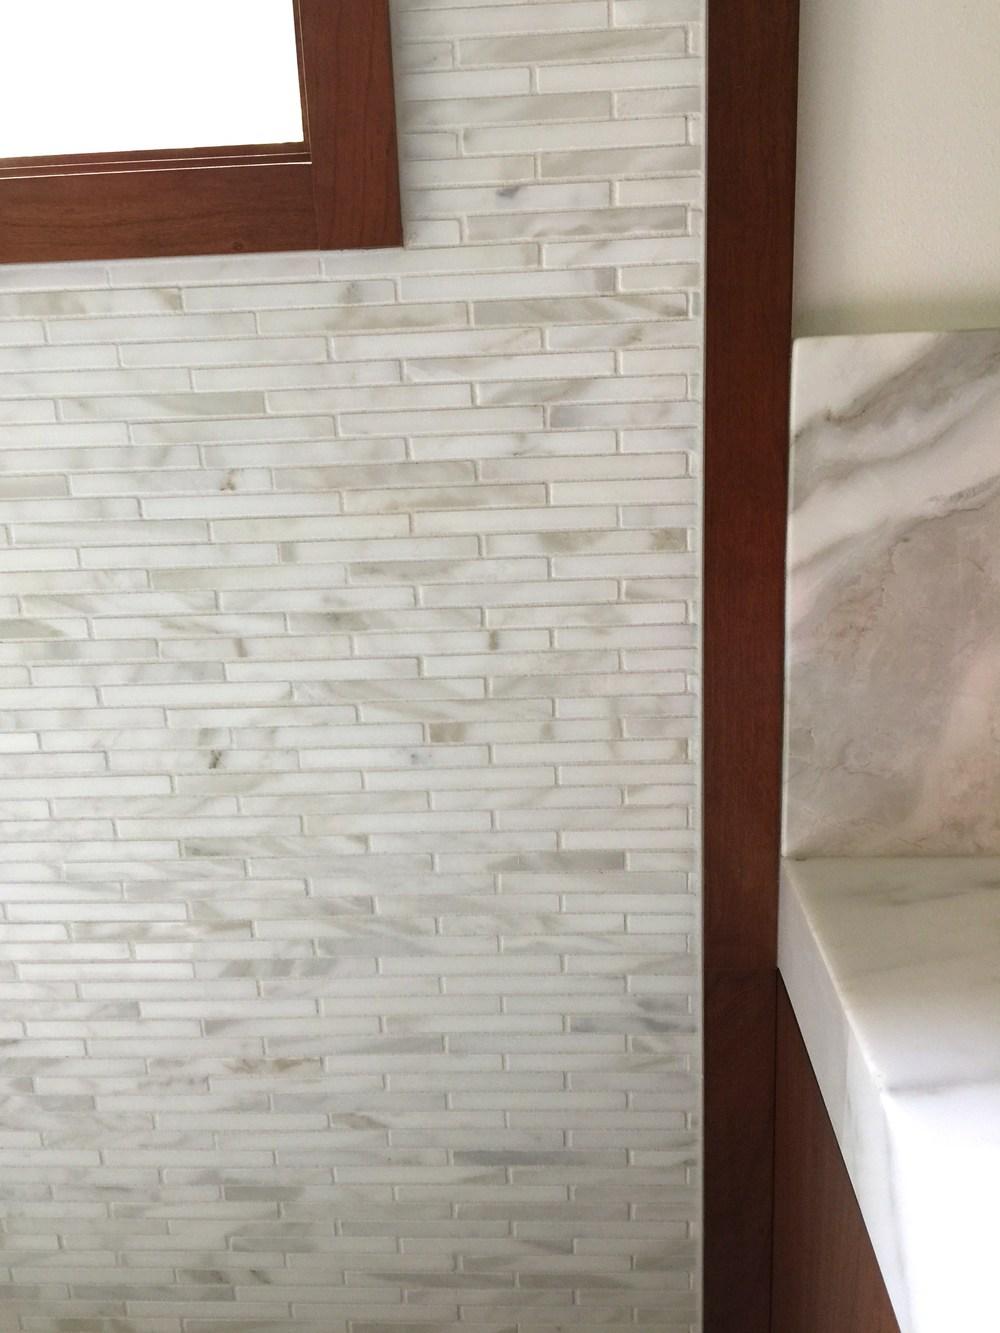 Master Bath Calacatta marble tile and wood trim detail | Interior Designer: Carla Aston